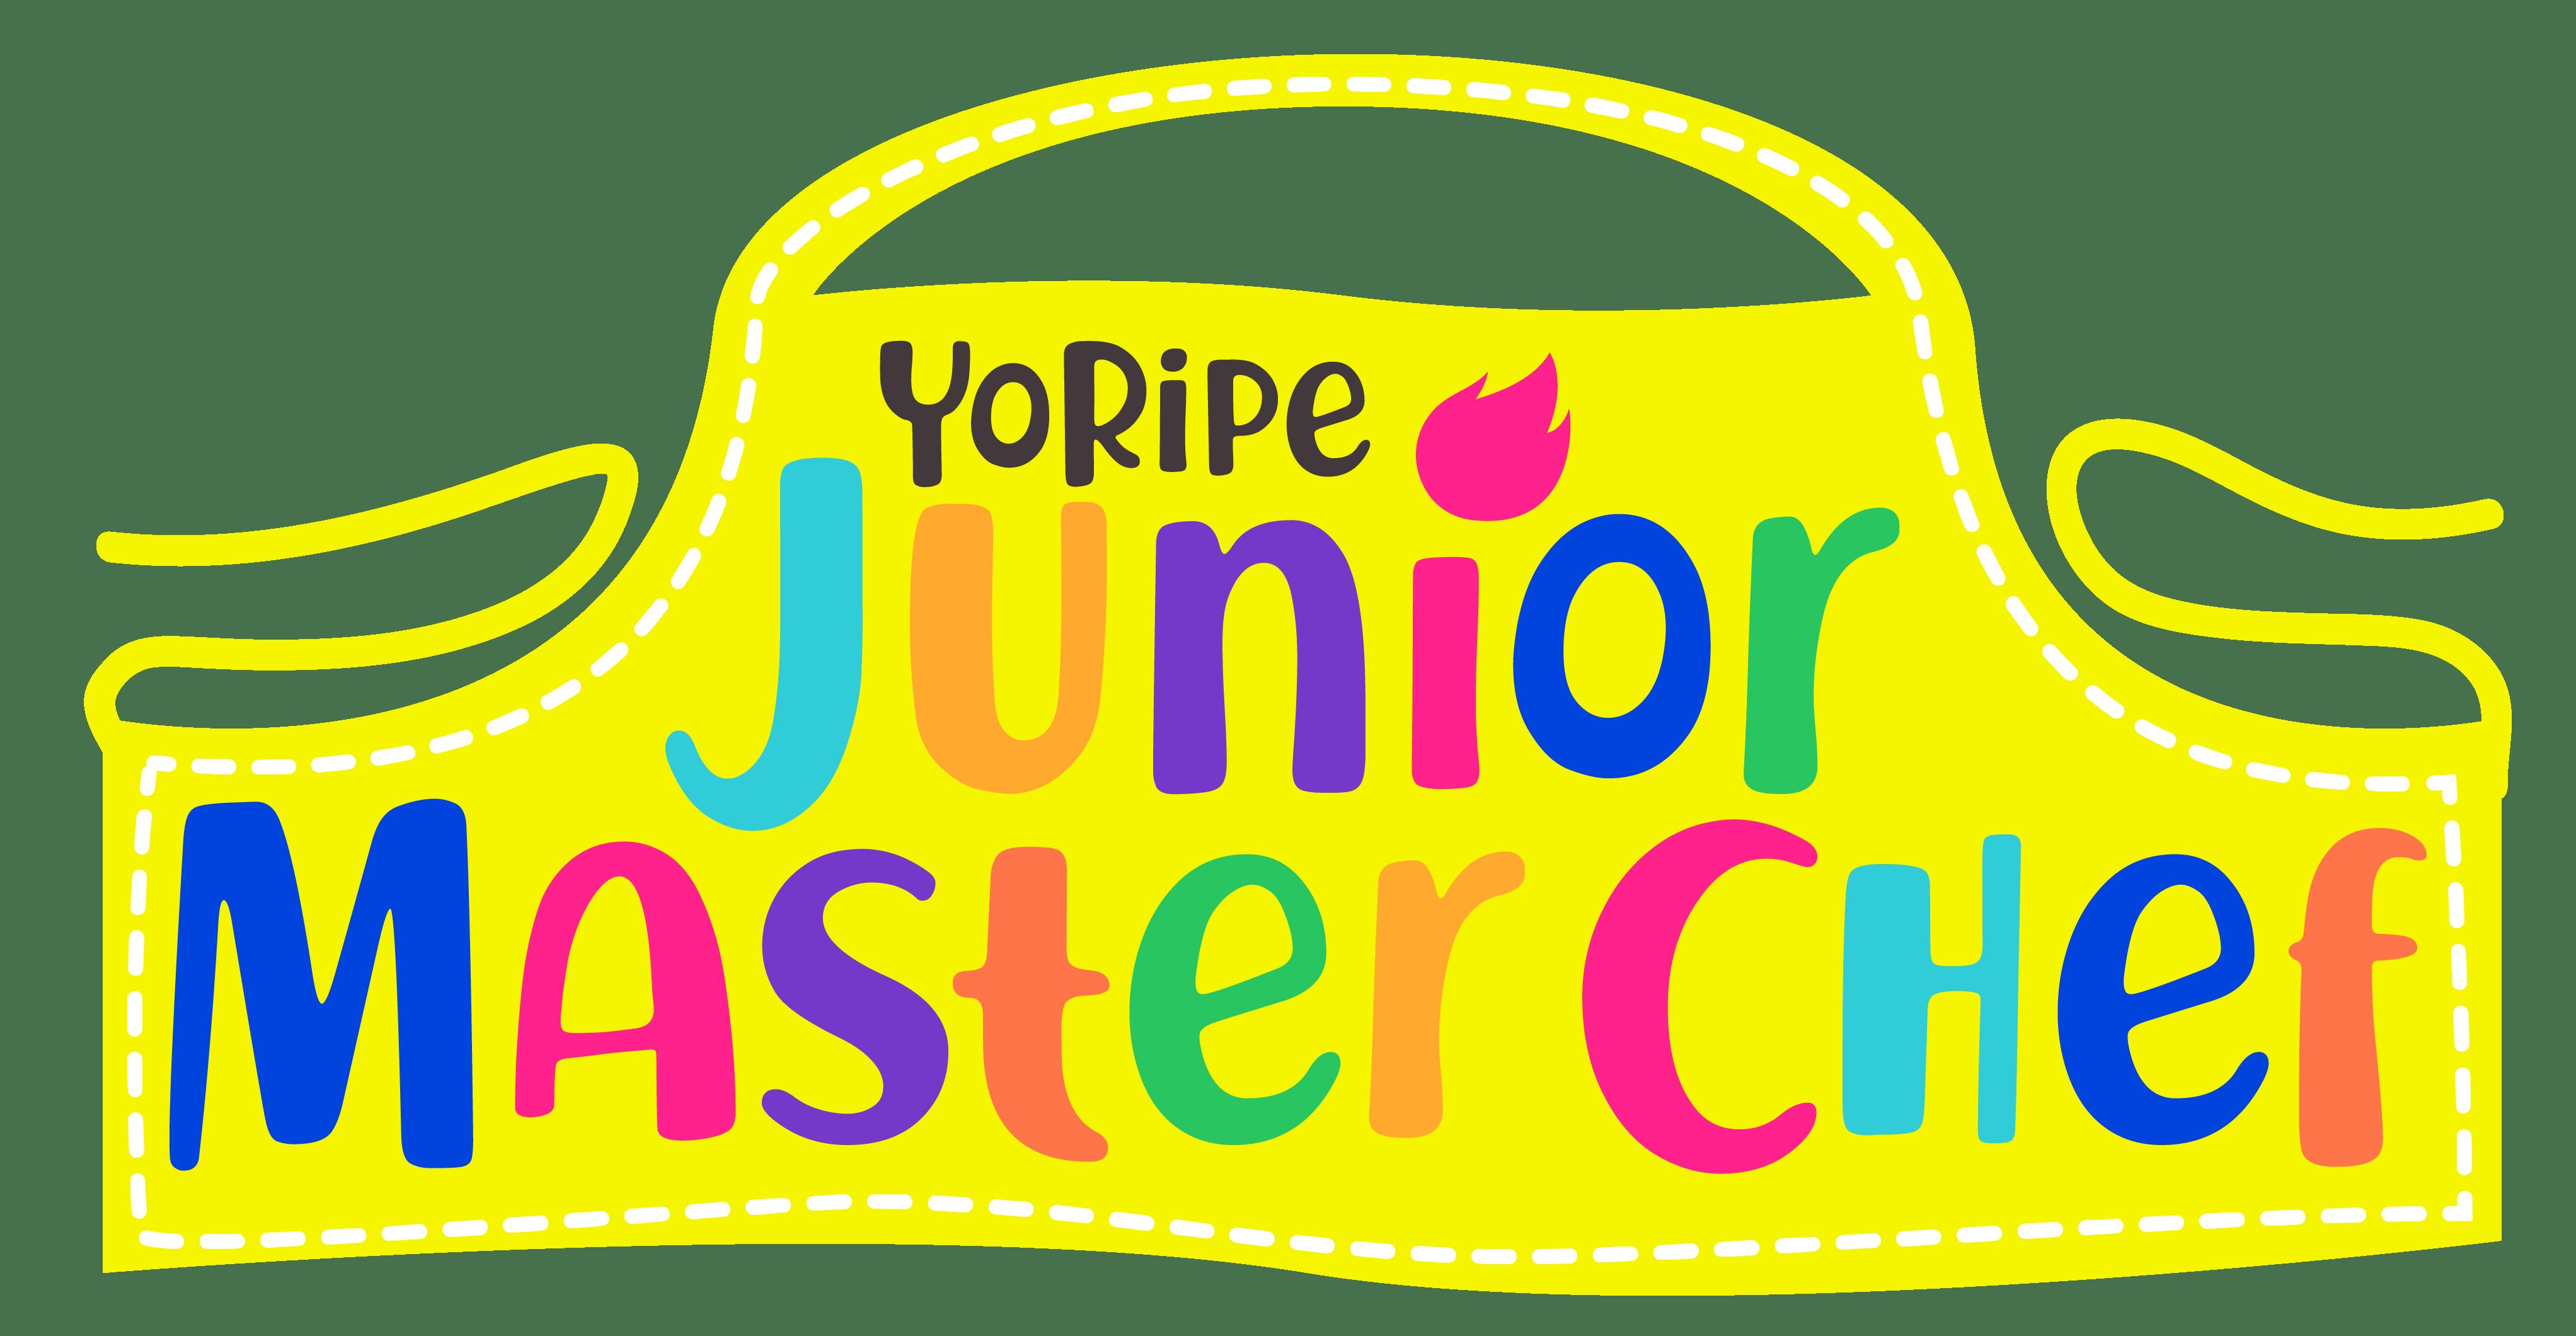 YoRipe Junior Master Chef Logo